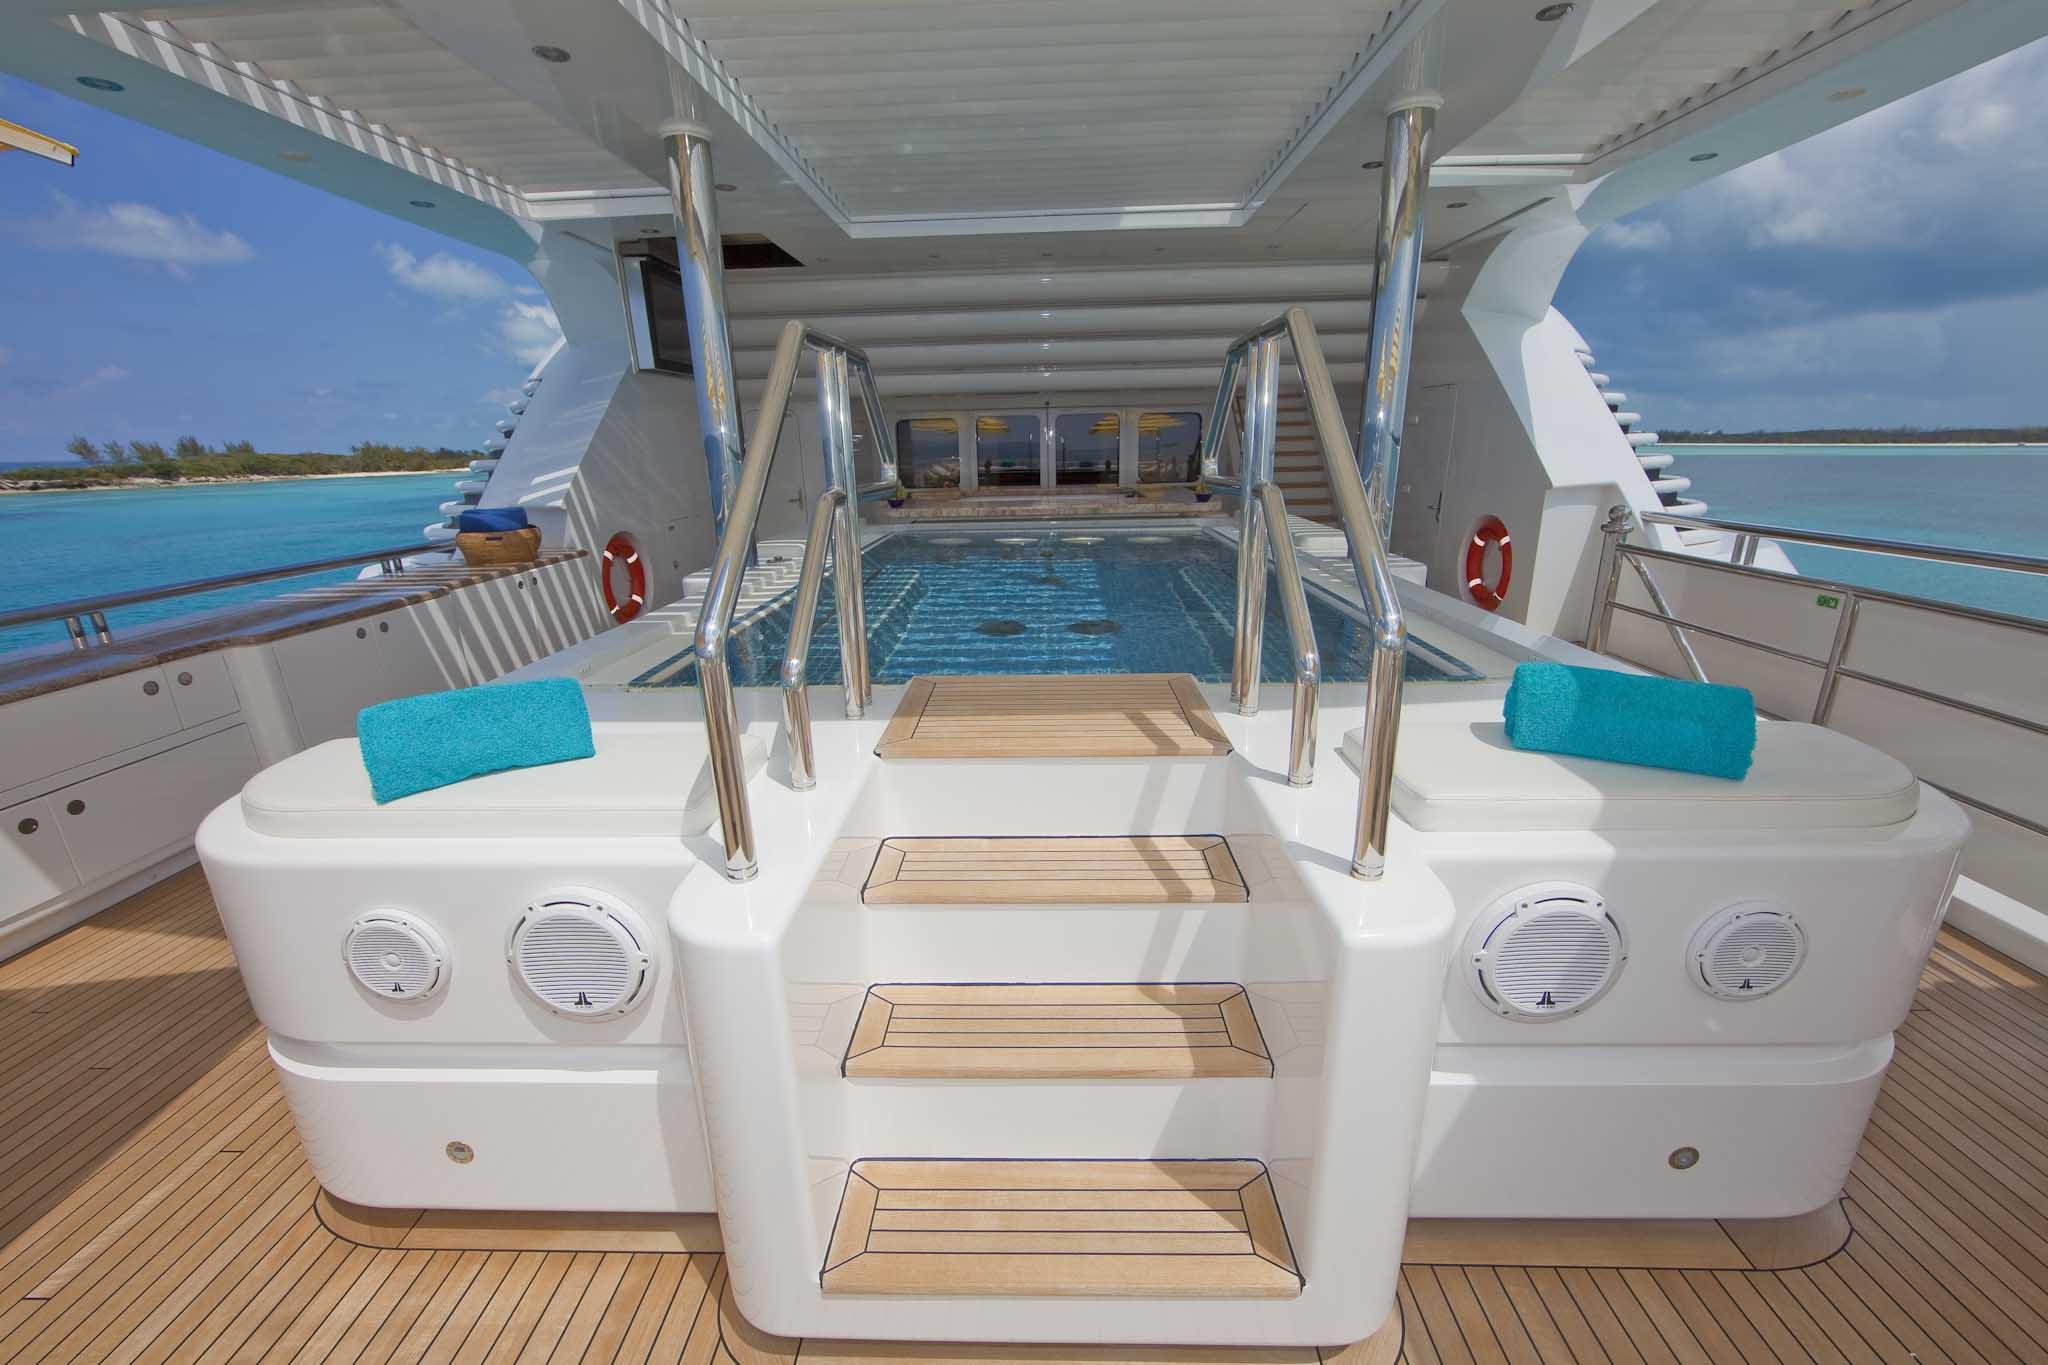 Superyacht TITANIA - Upper Deck Spa Pool